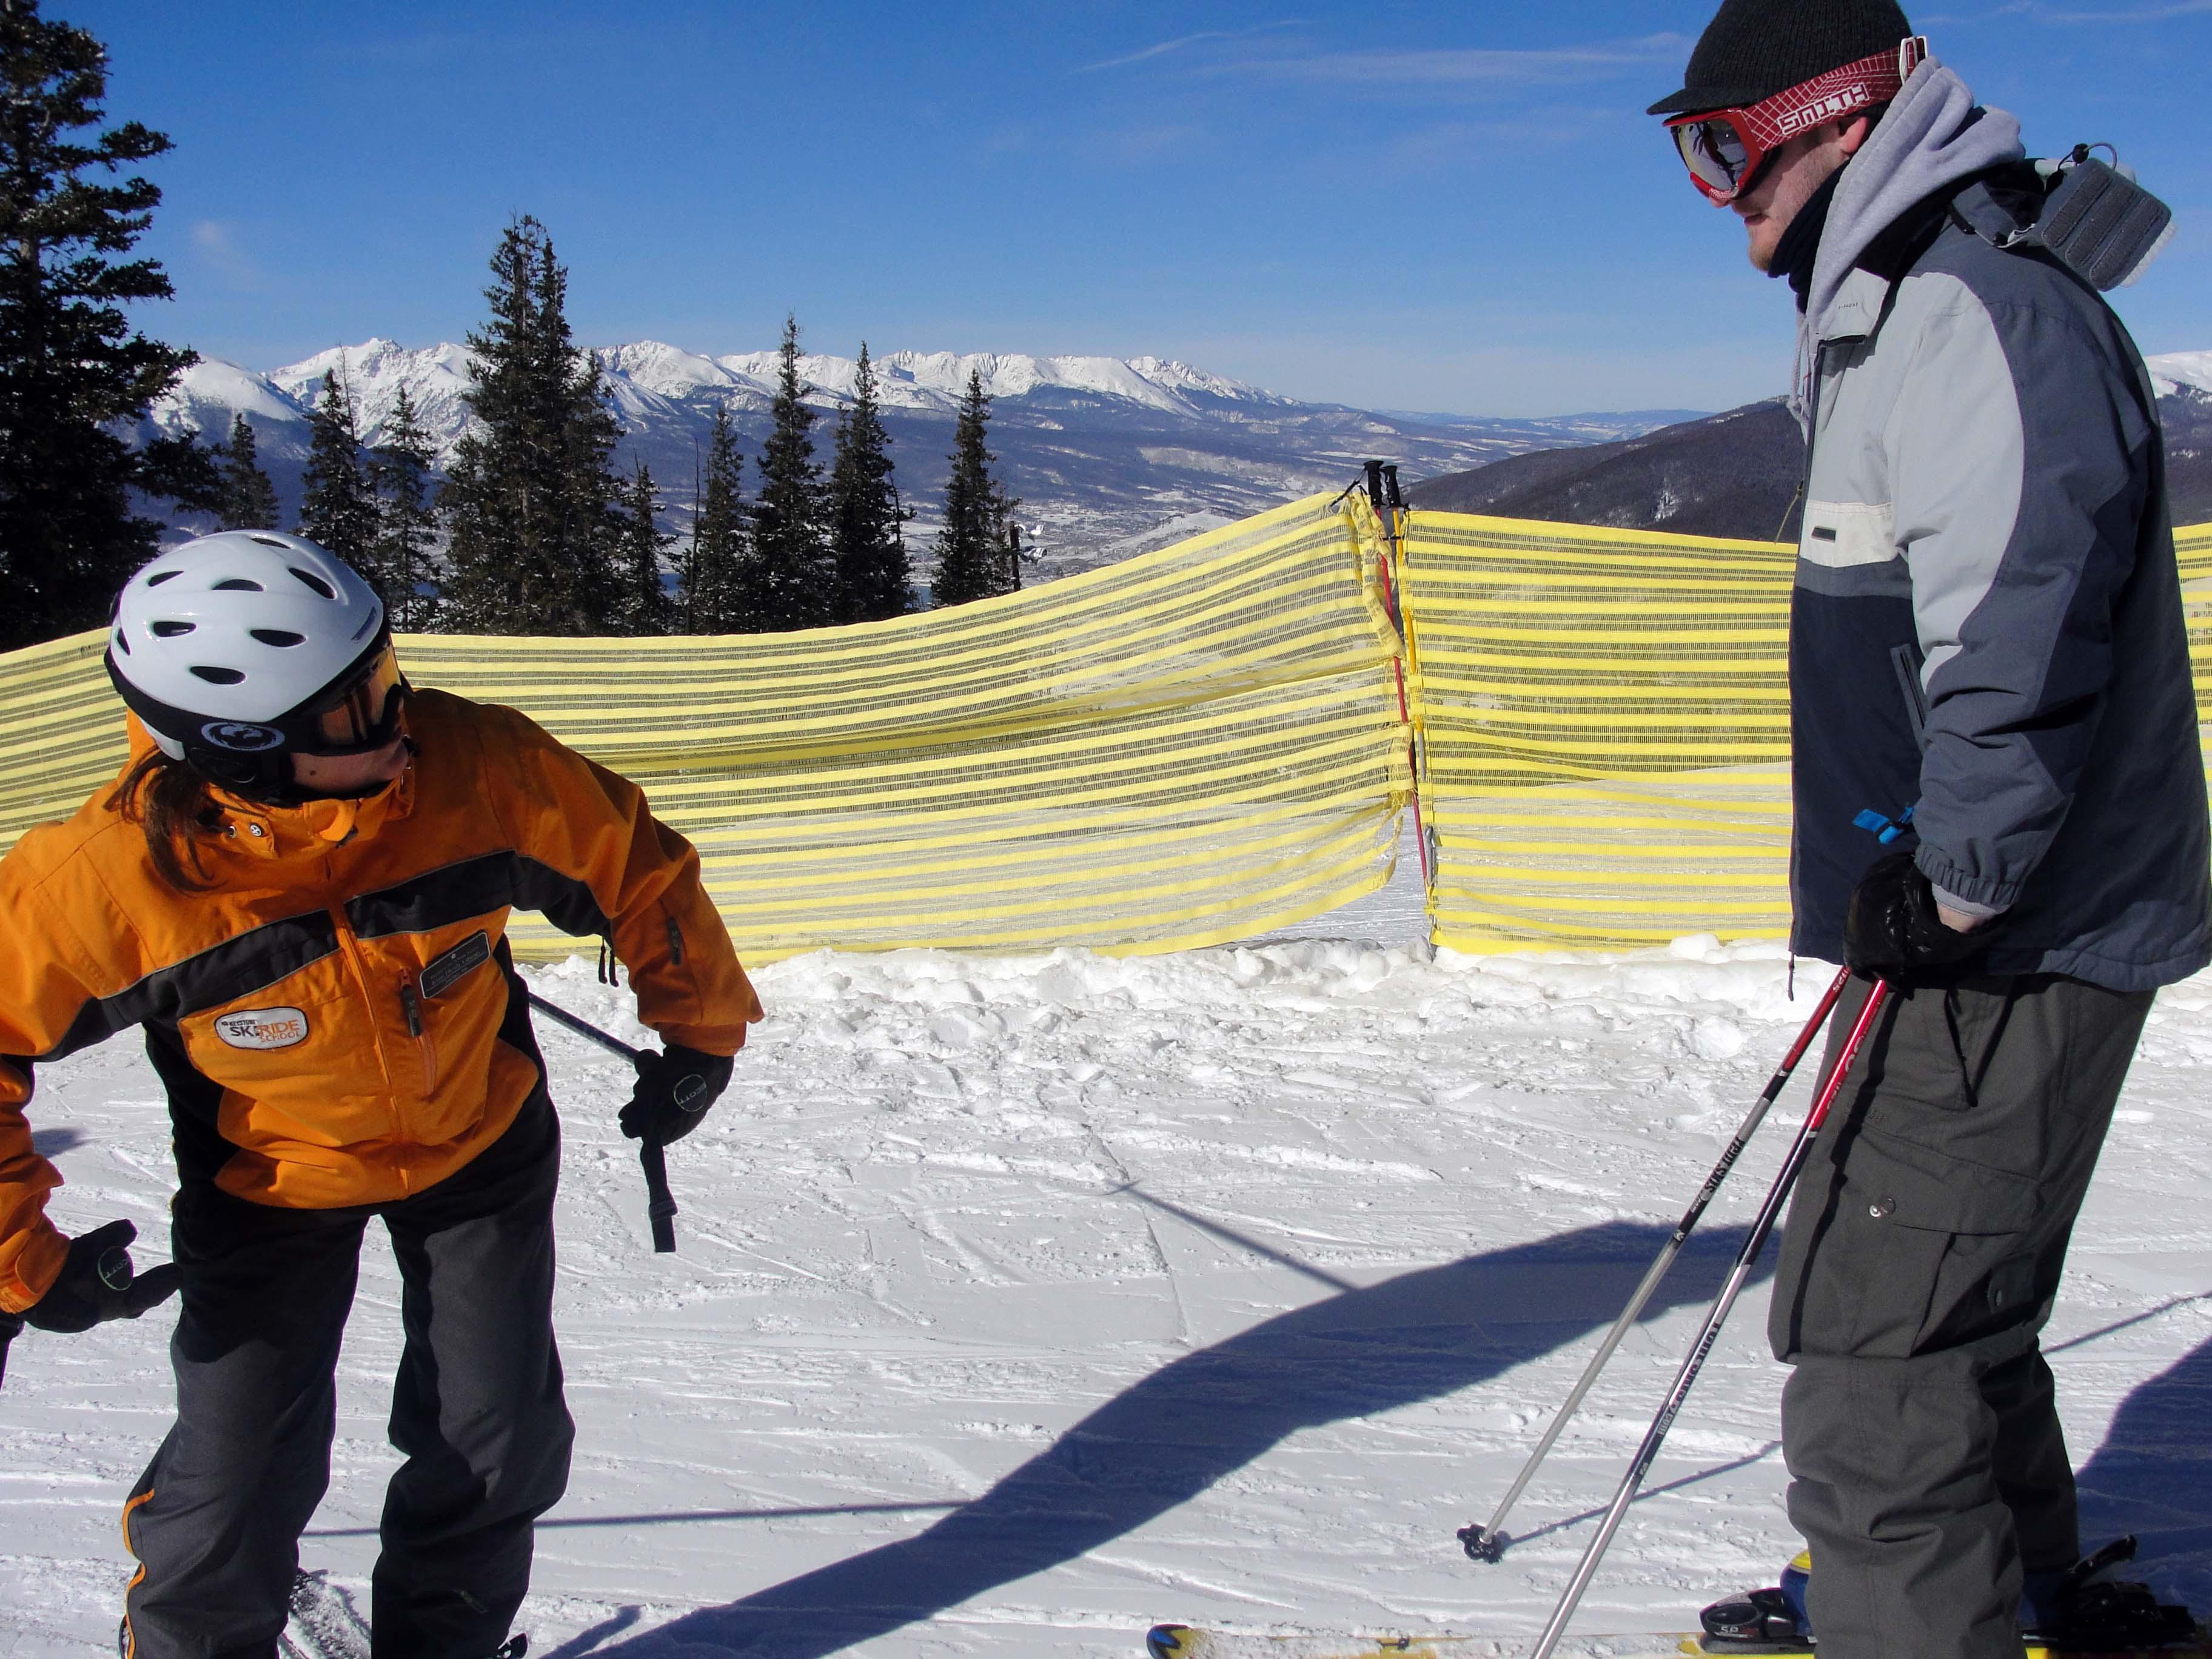 Kim teaching Bryan skiing techniques